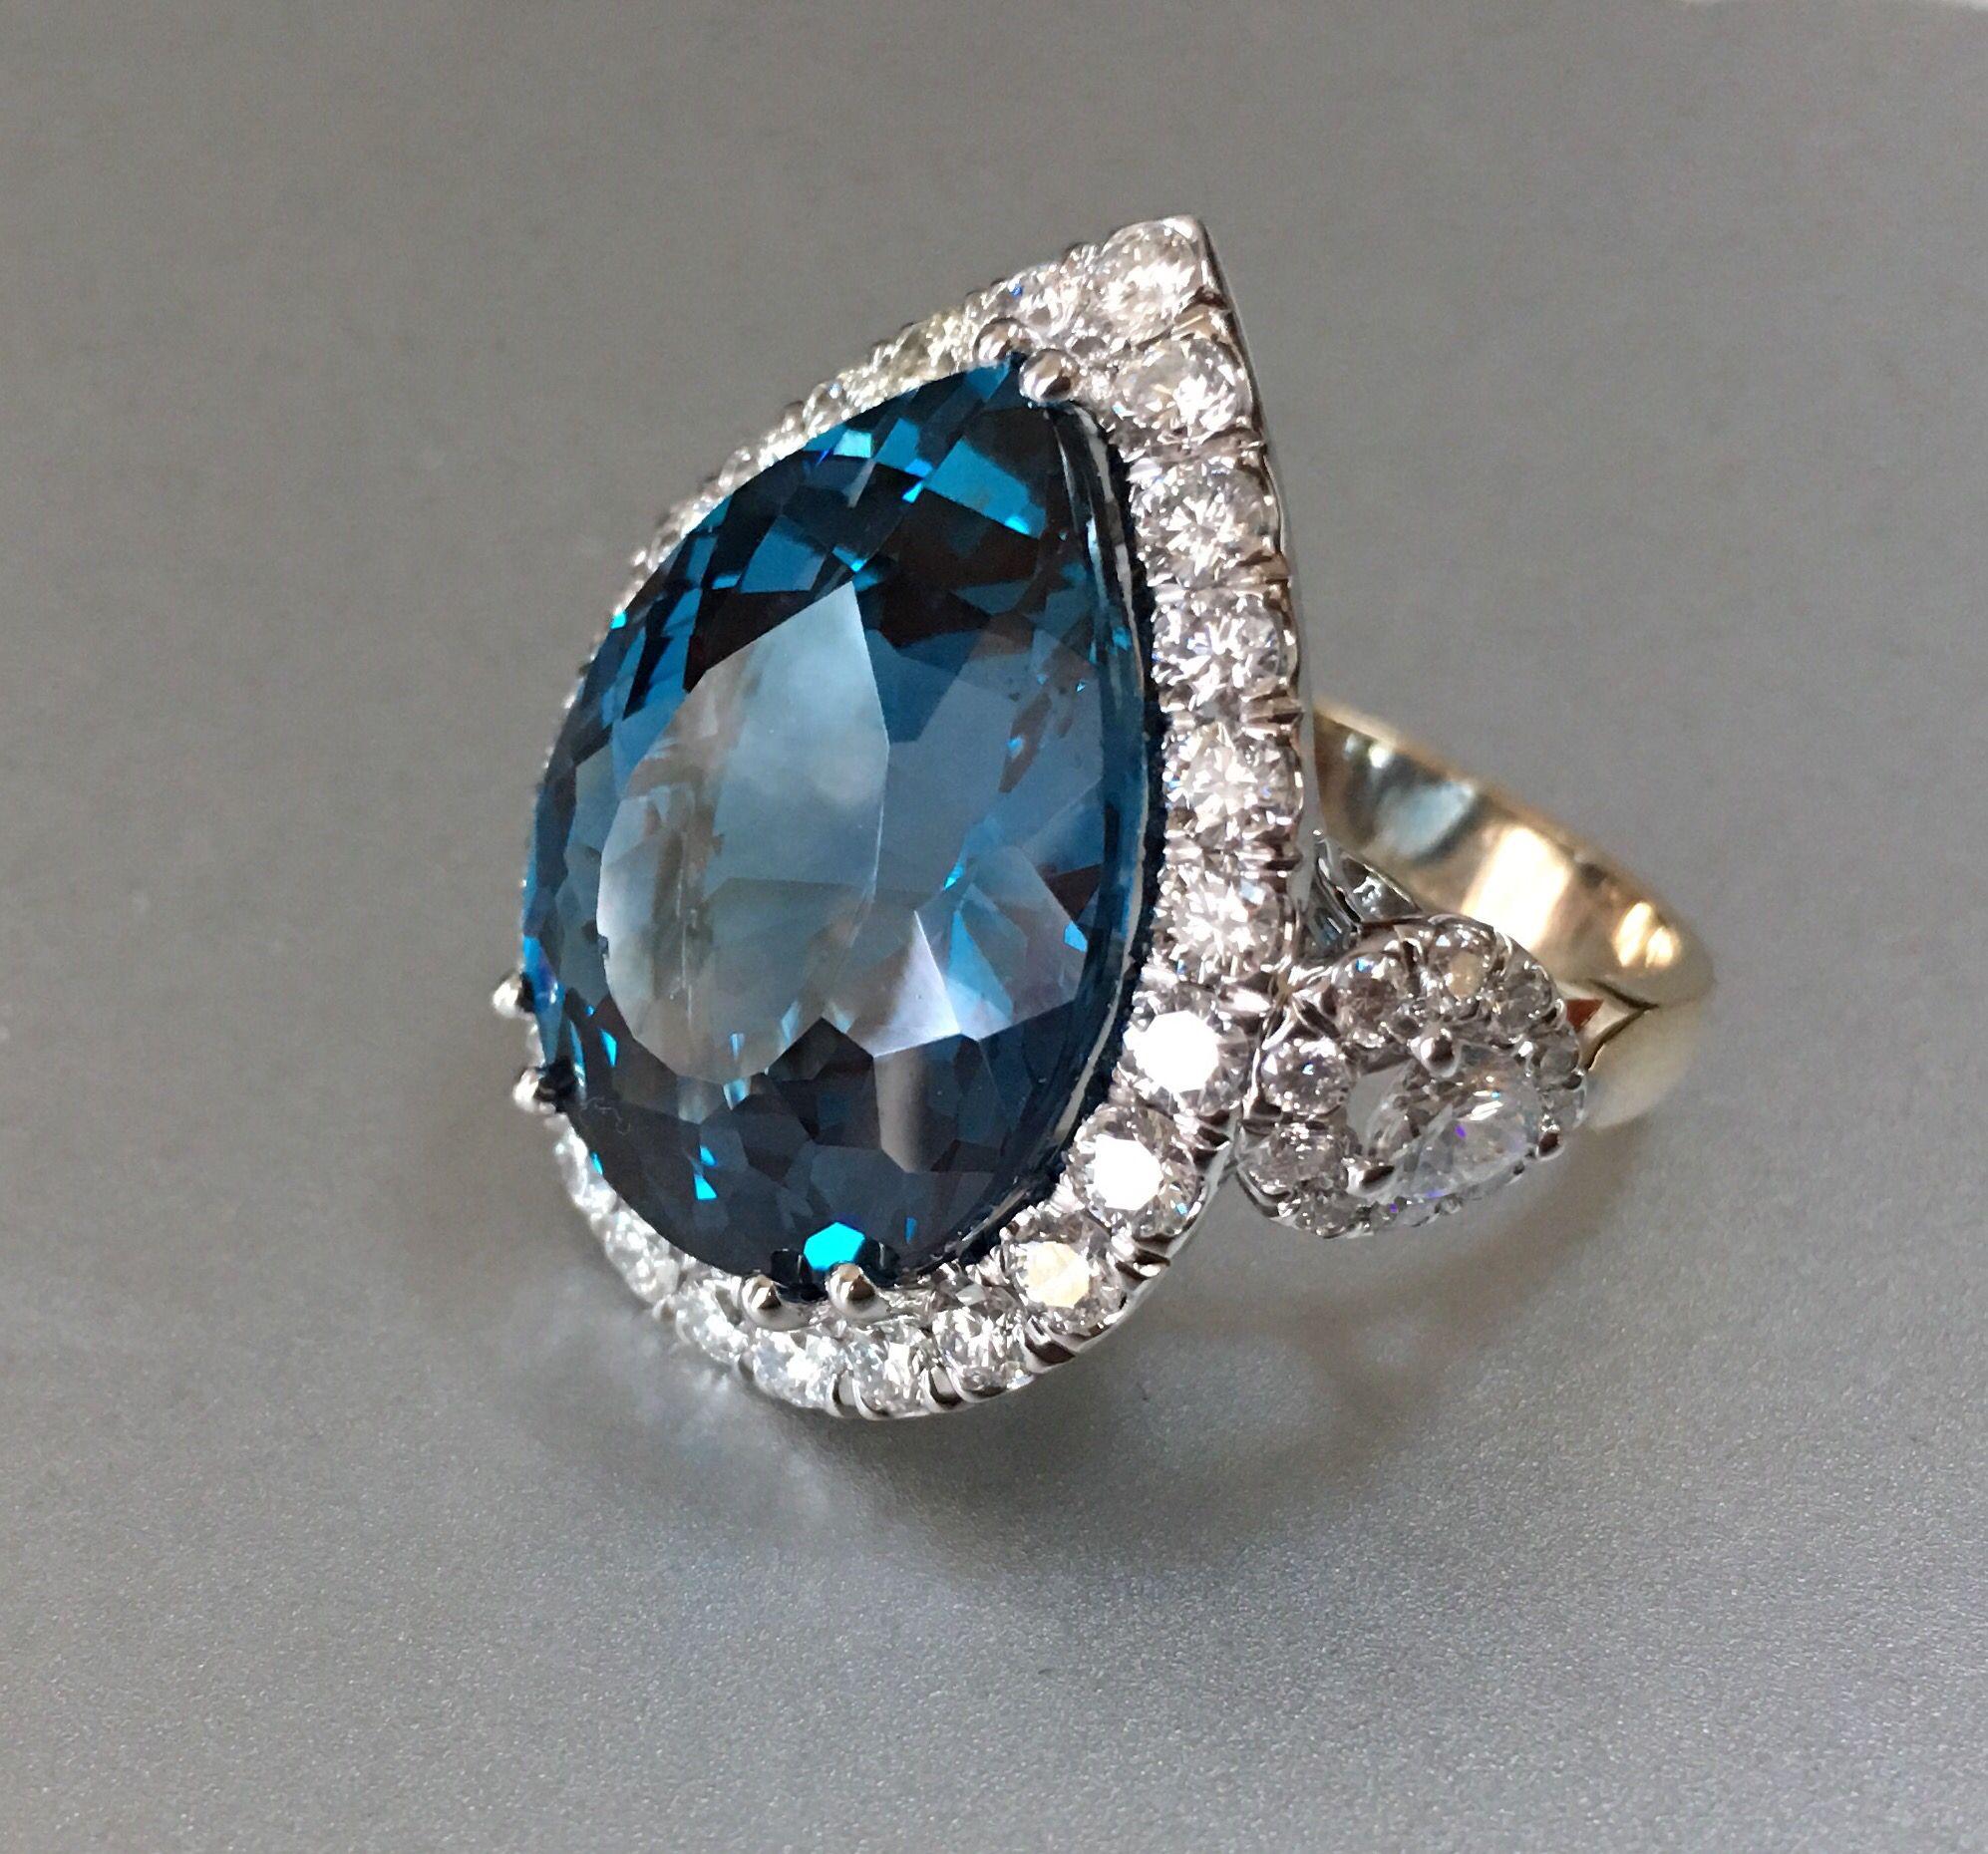 Blue Topaz Diamond Ring. Large, stunning, teardrop topaz